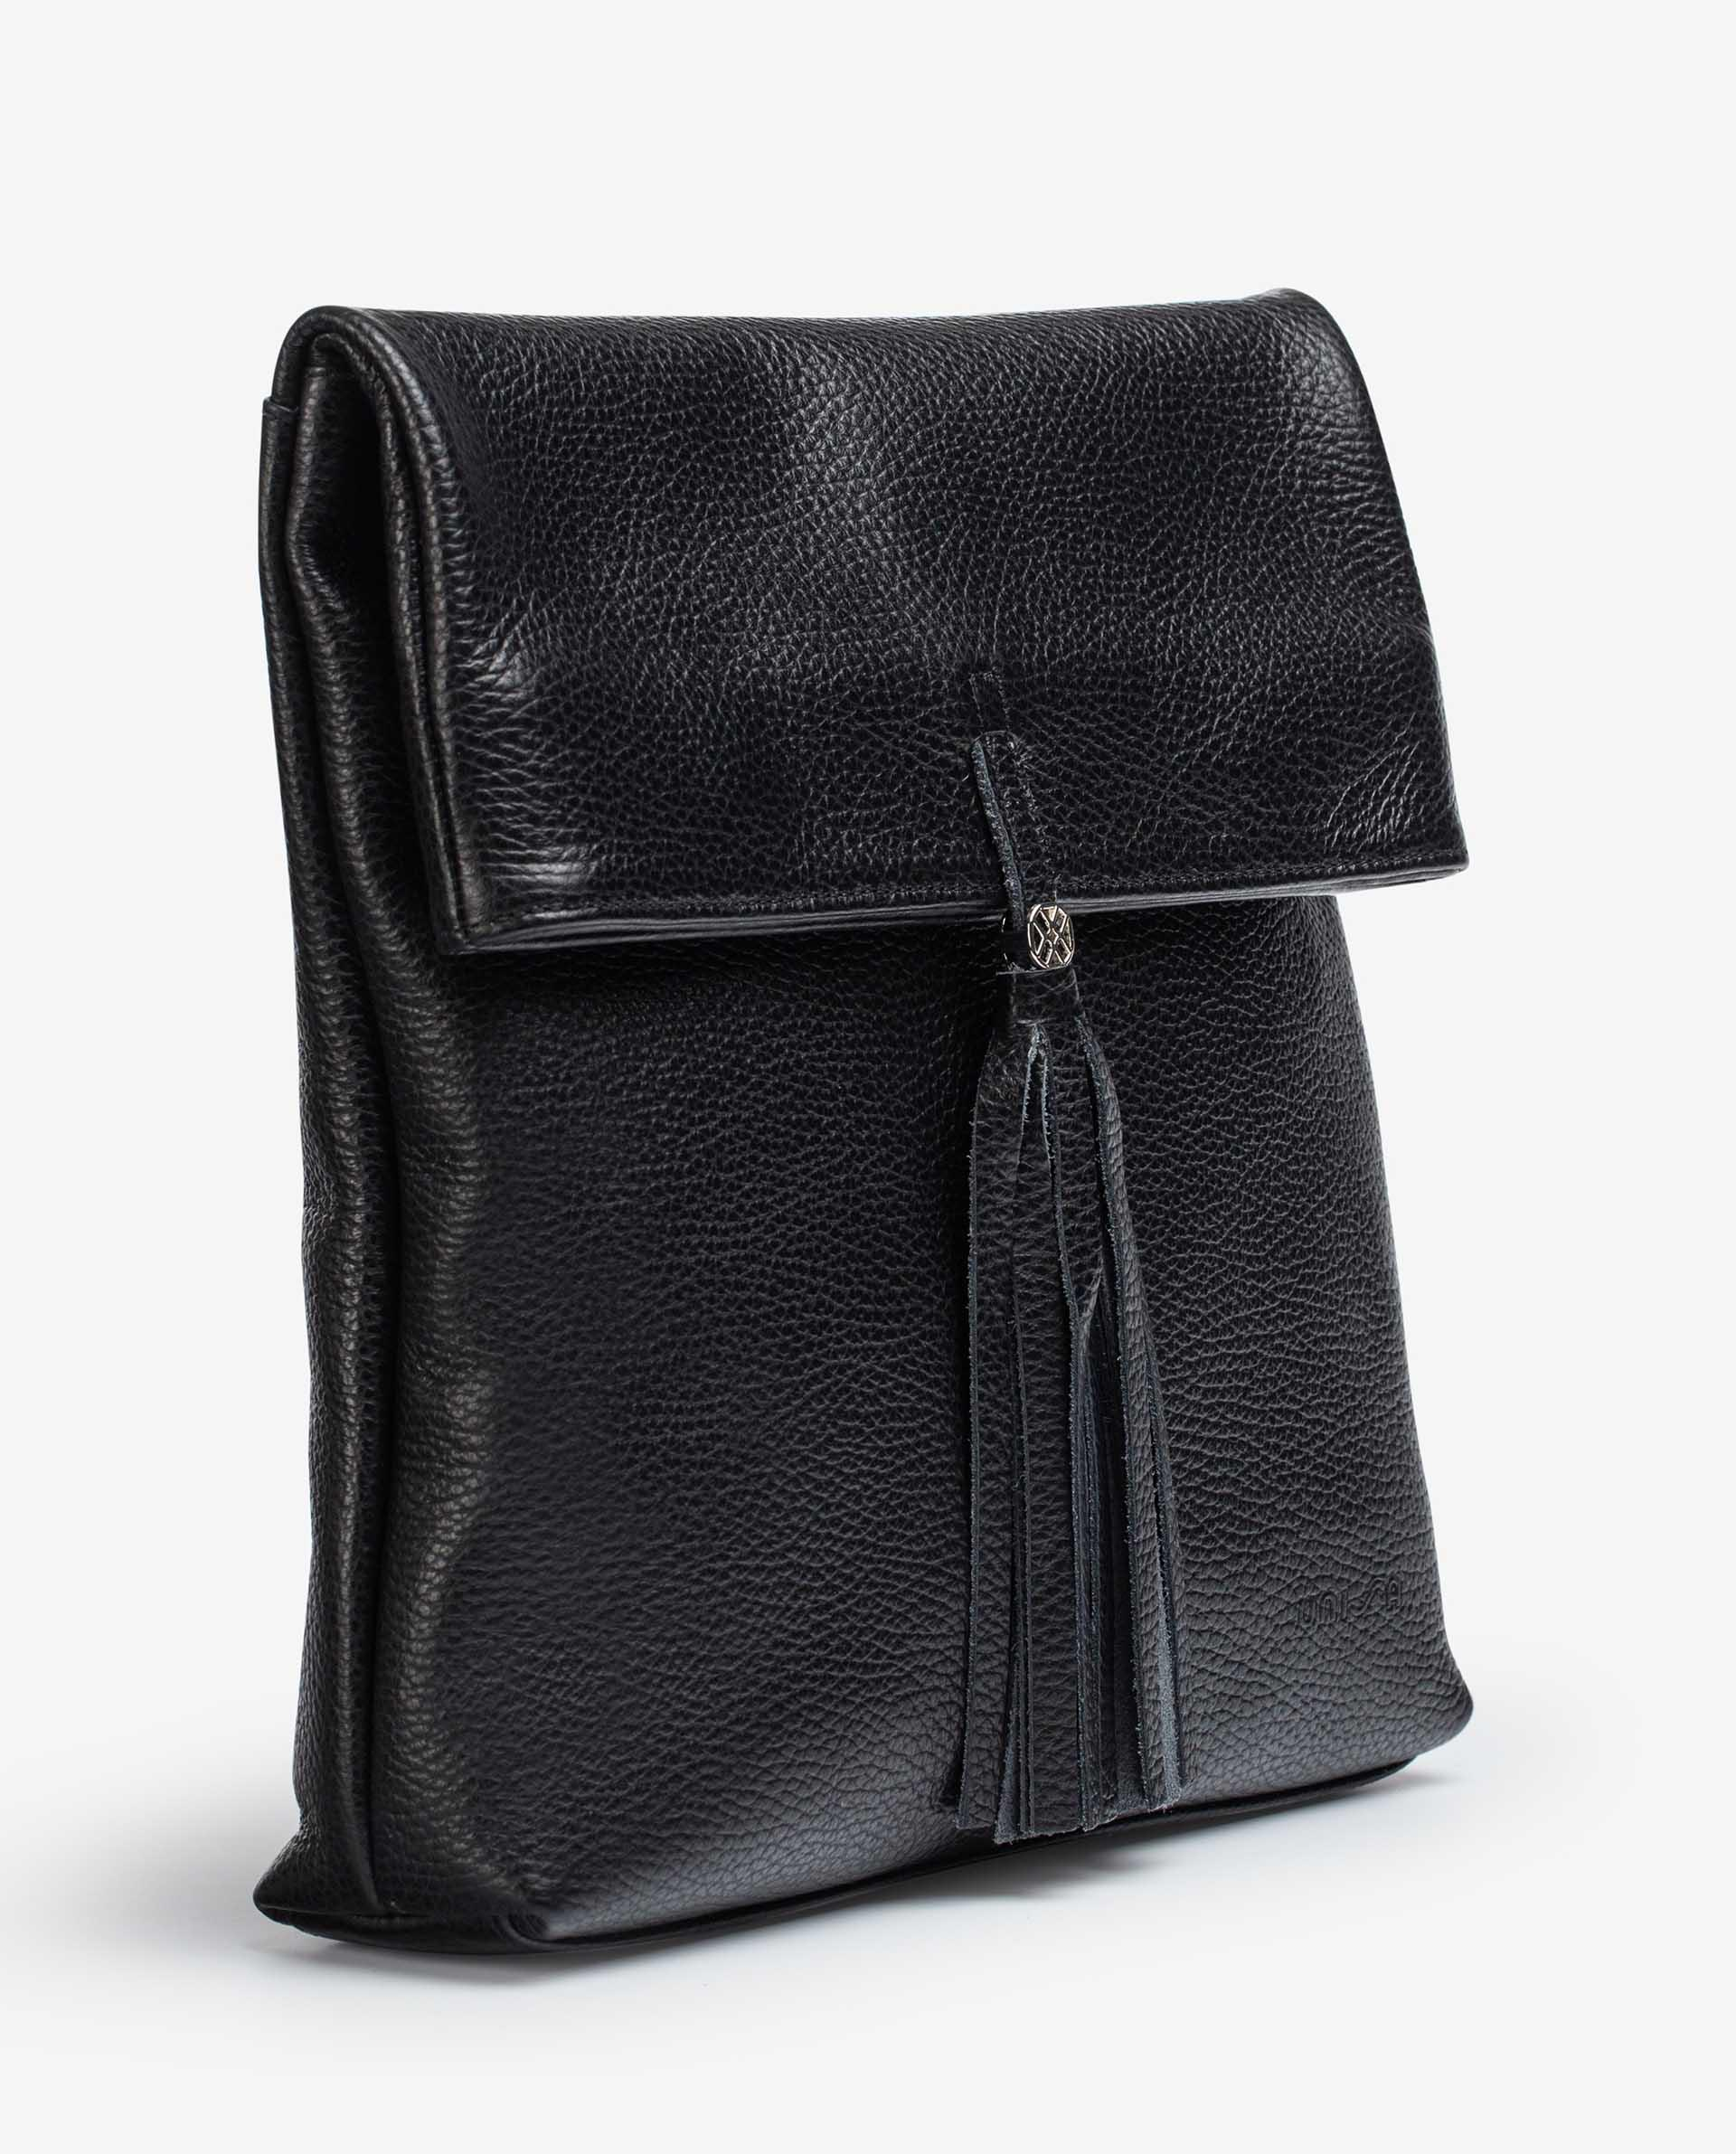 UNISA Handtasche zum Umklappen aus Leder ZKALIKA_MM 5